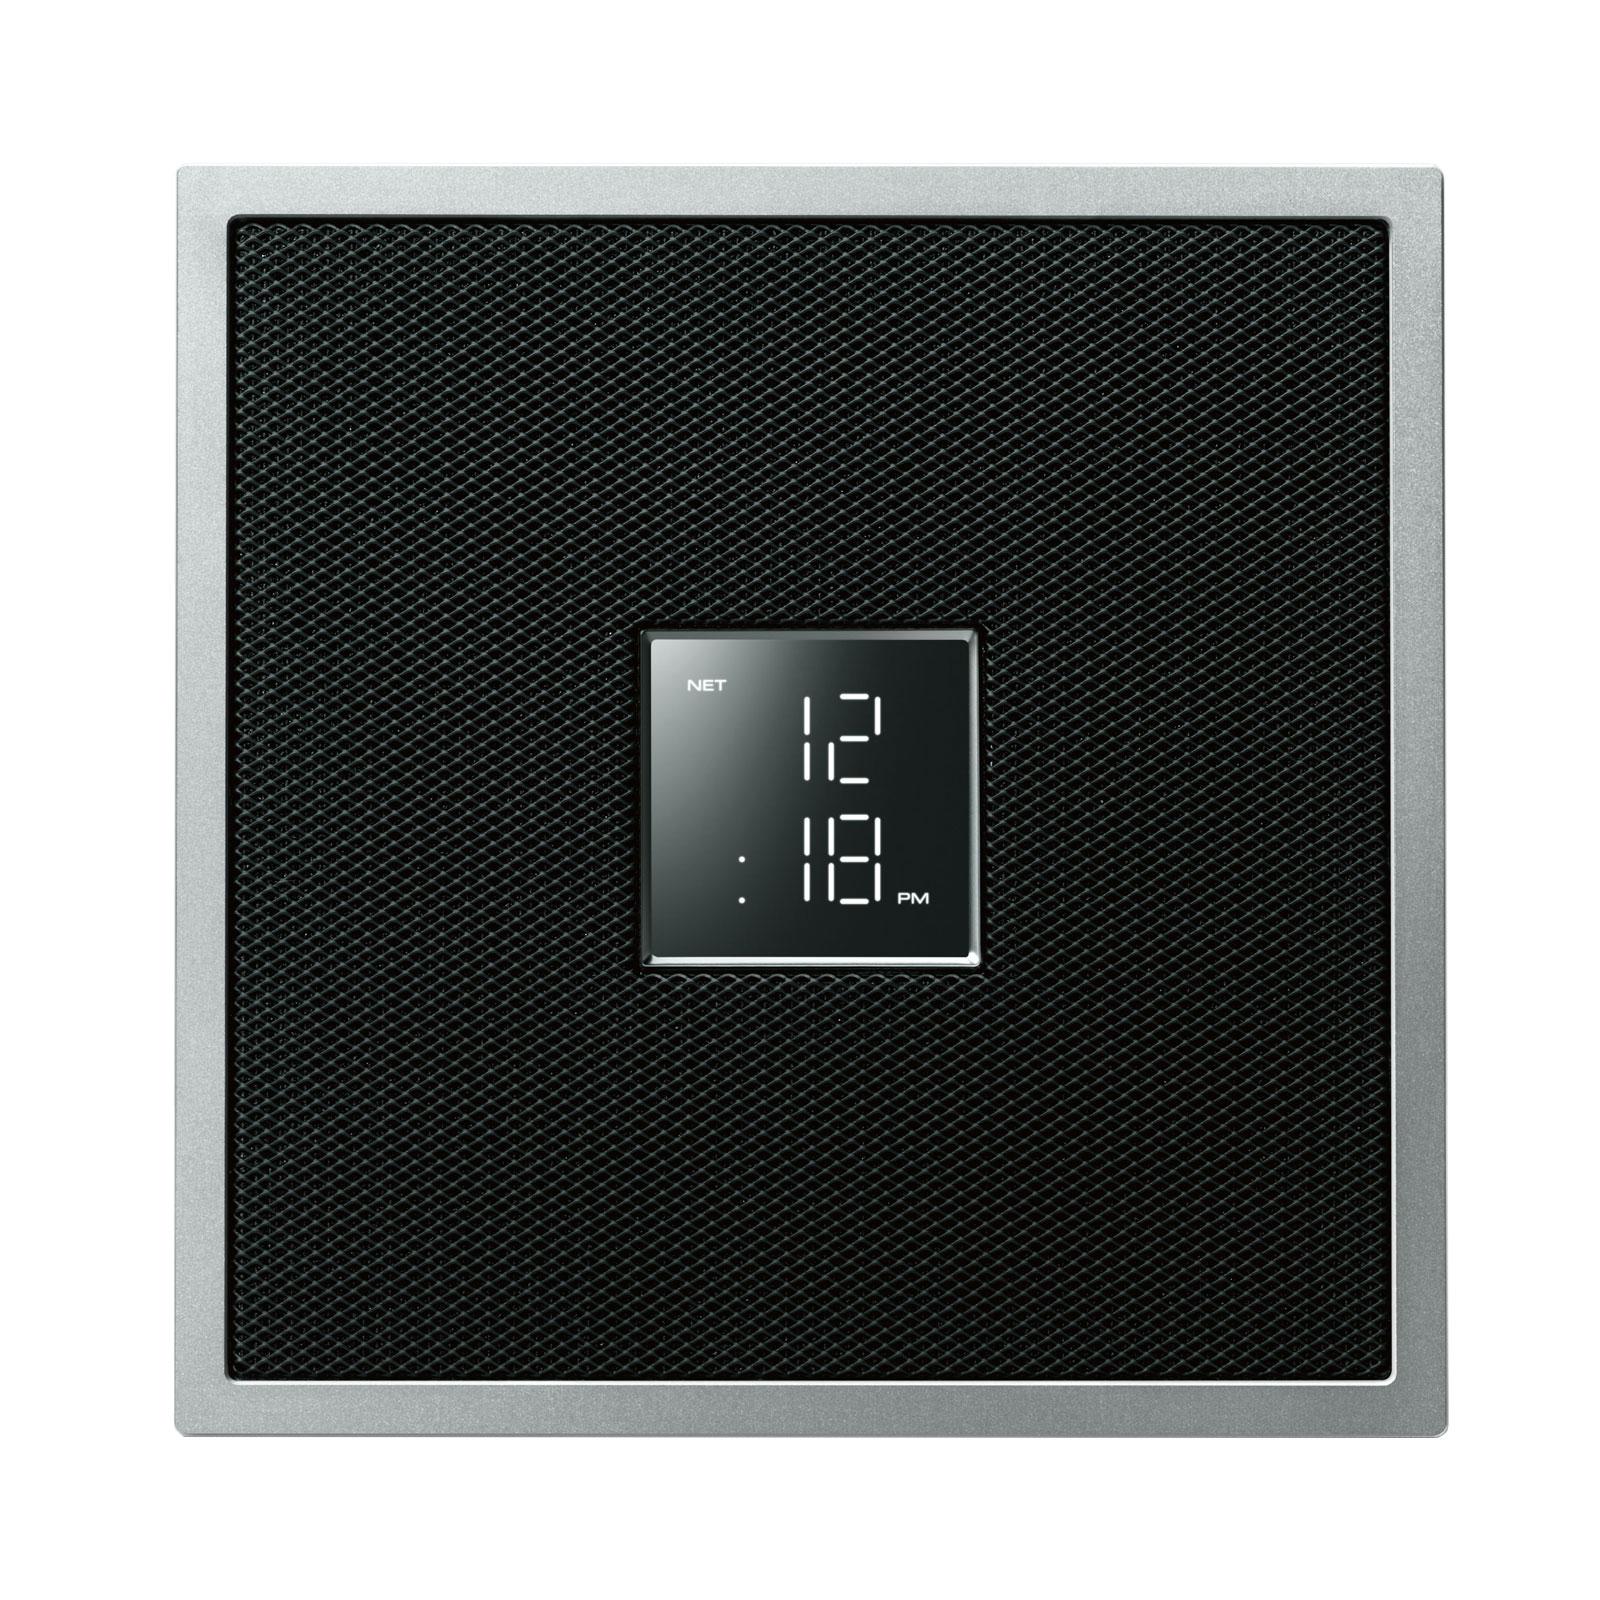 yamaha musiccast isx 18d noir dock enceinte bluetooth. Black Bedroom Furniture Sets. Home Design Ideas